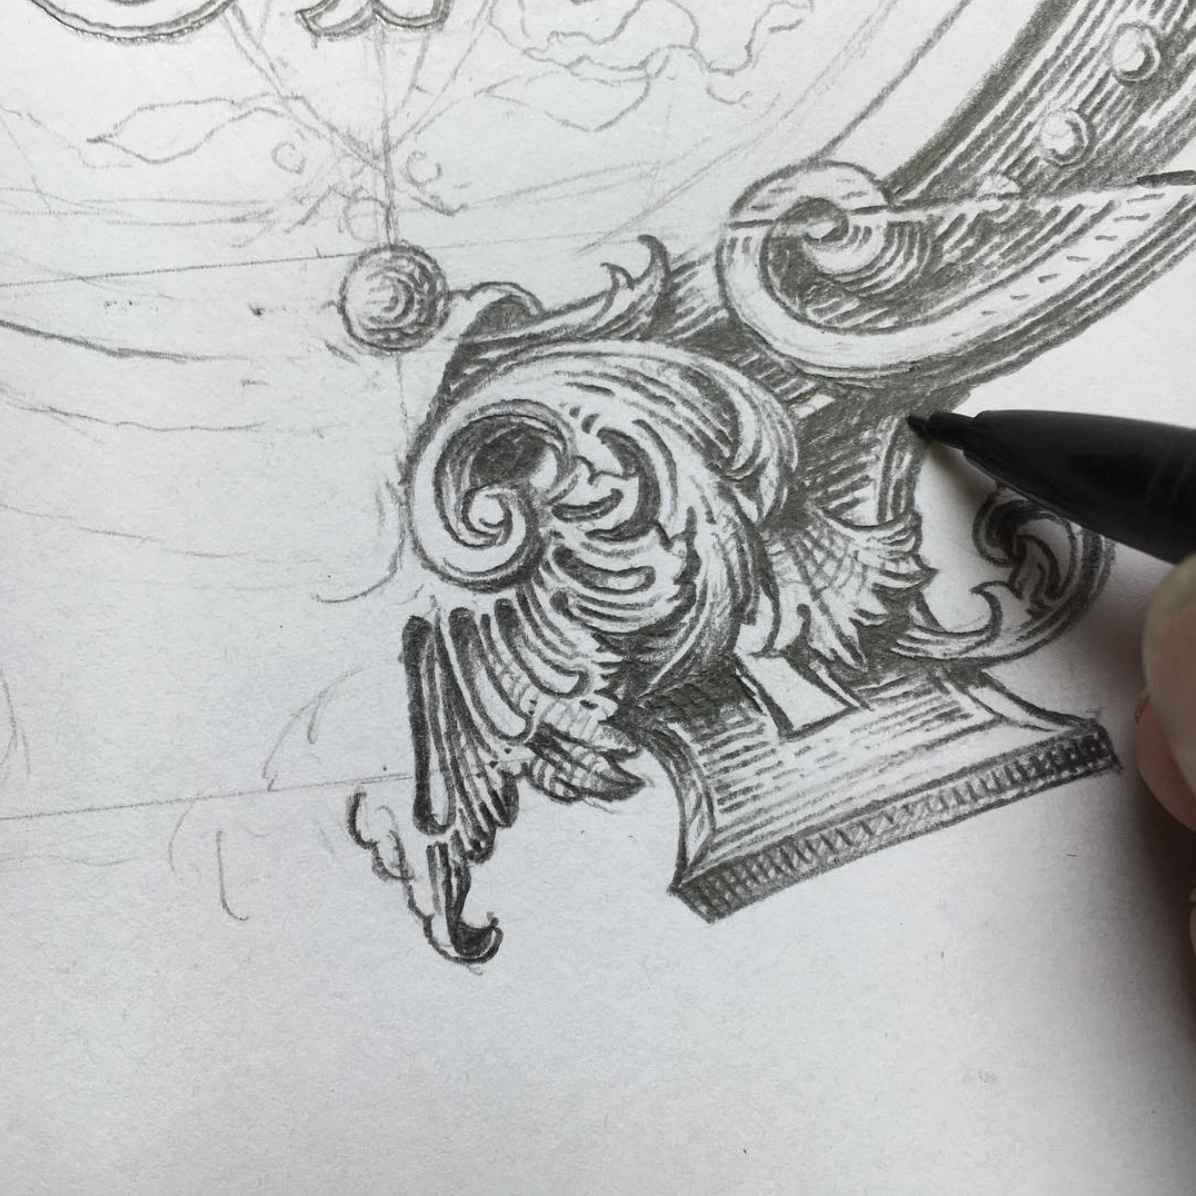 font,fonts,handmadefont,Calligraphy  ,artists,art,victorian art,Sign writting